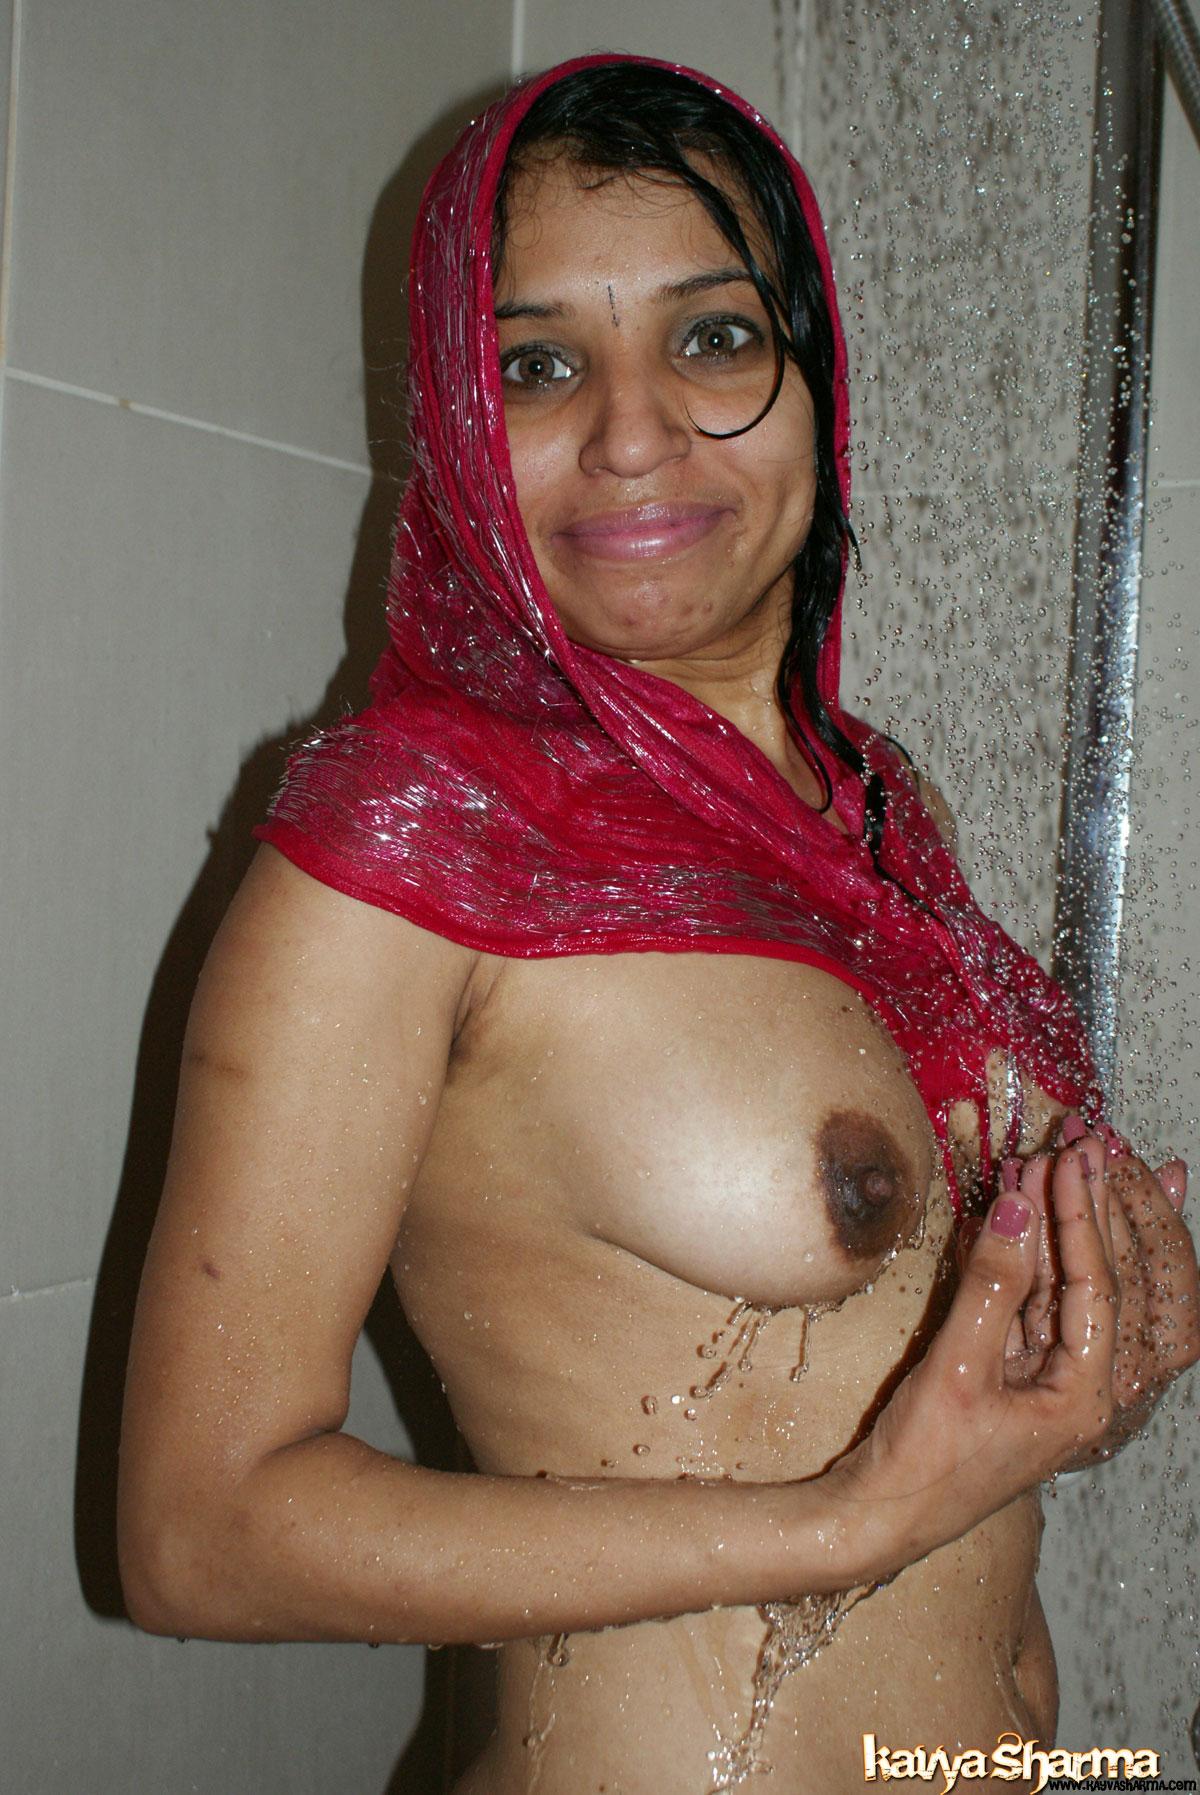 pic4 - nude girls pics indian bath